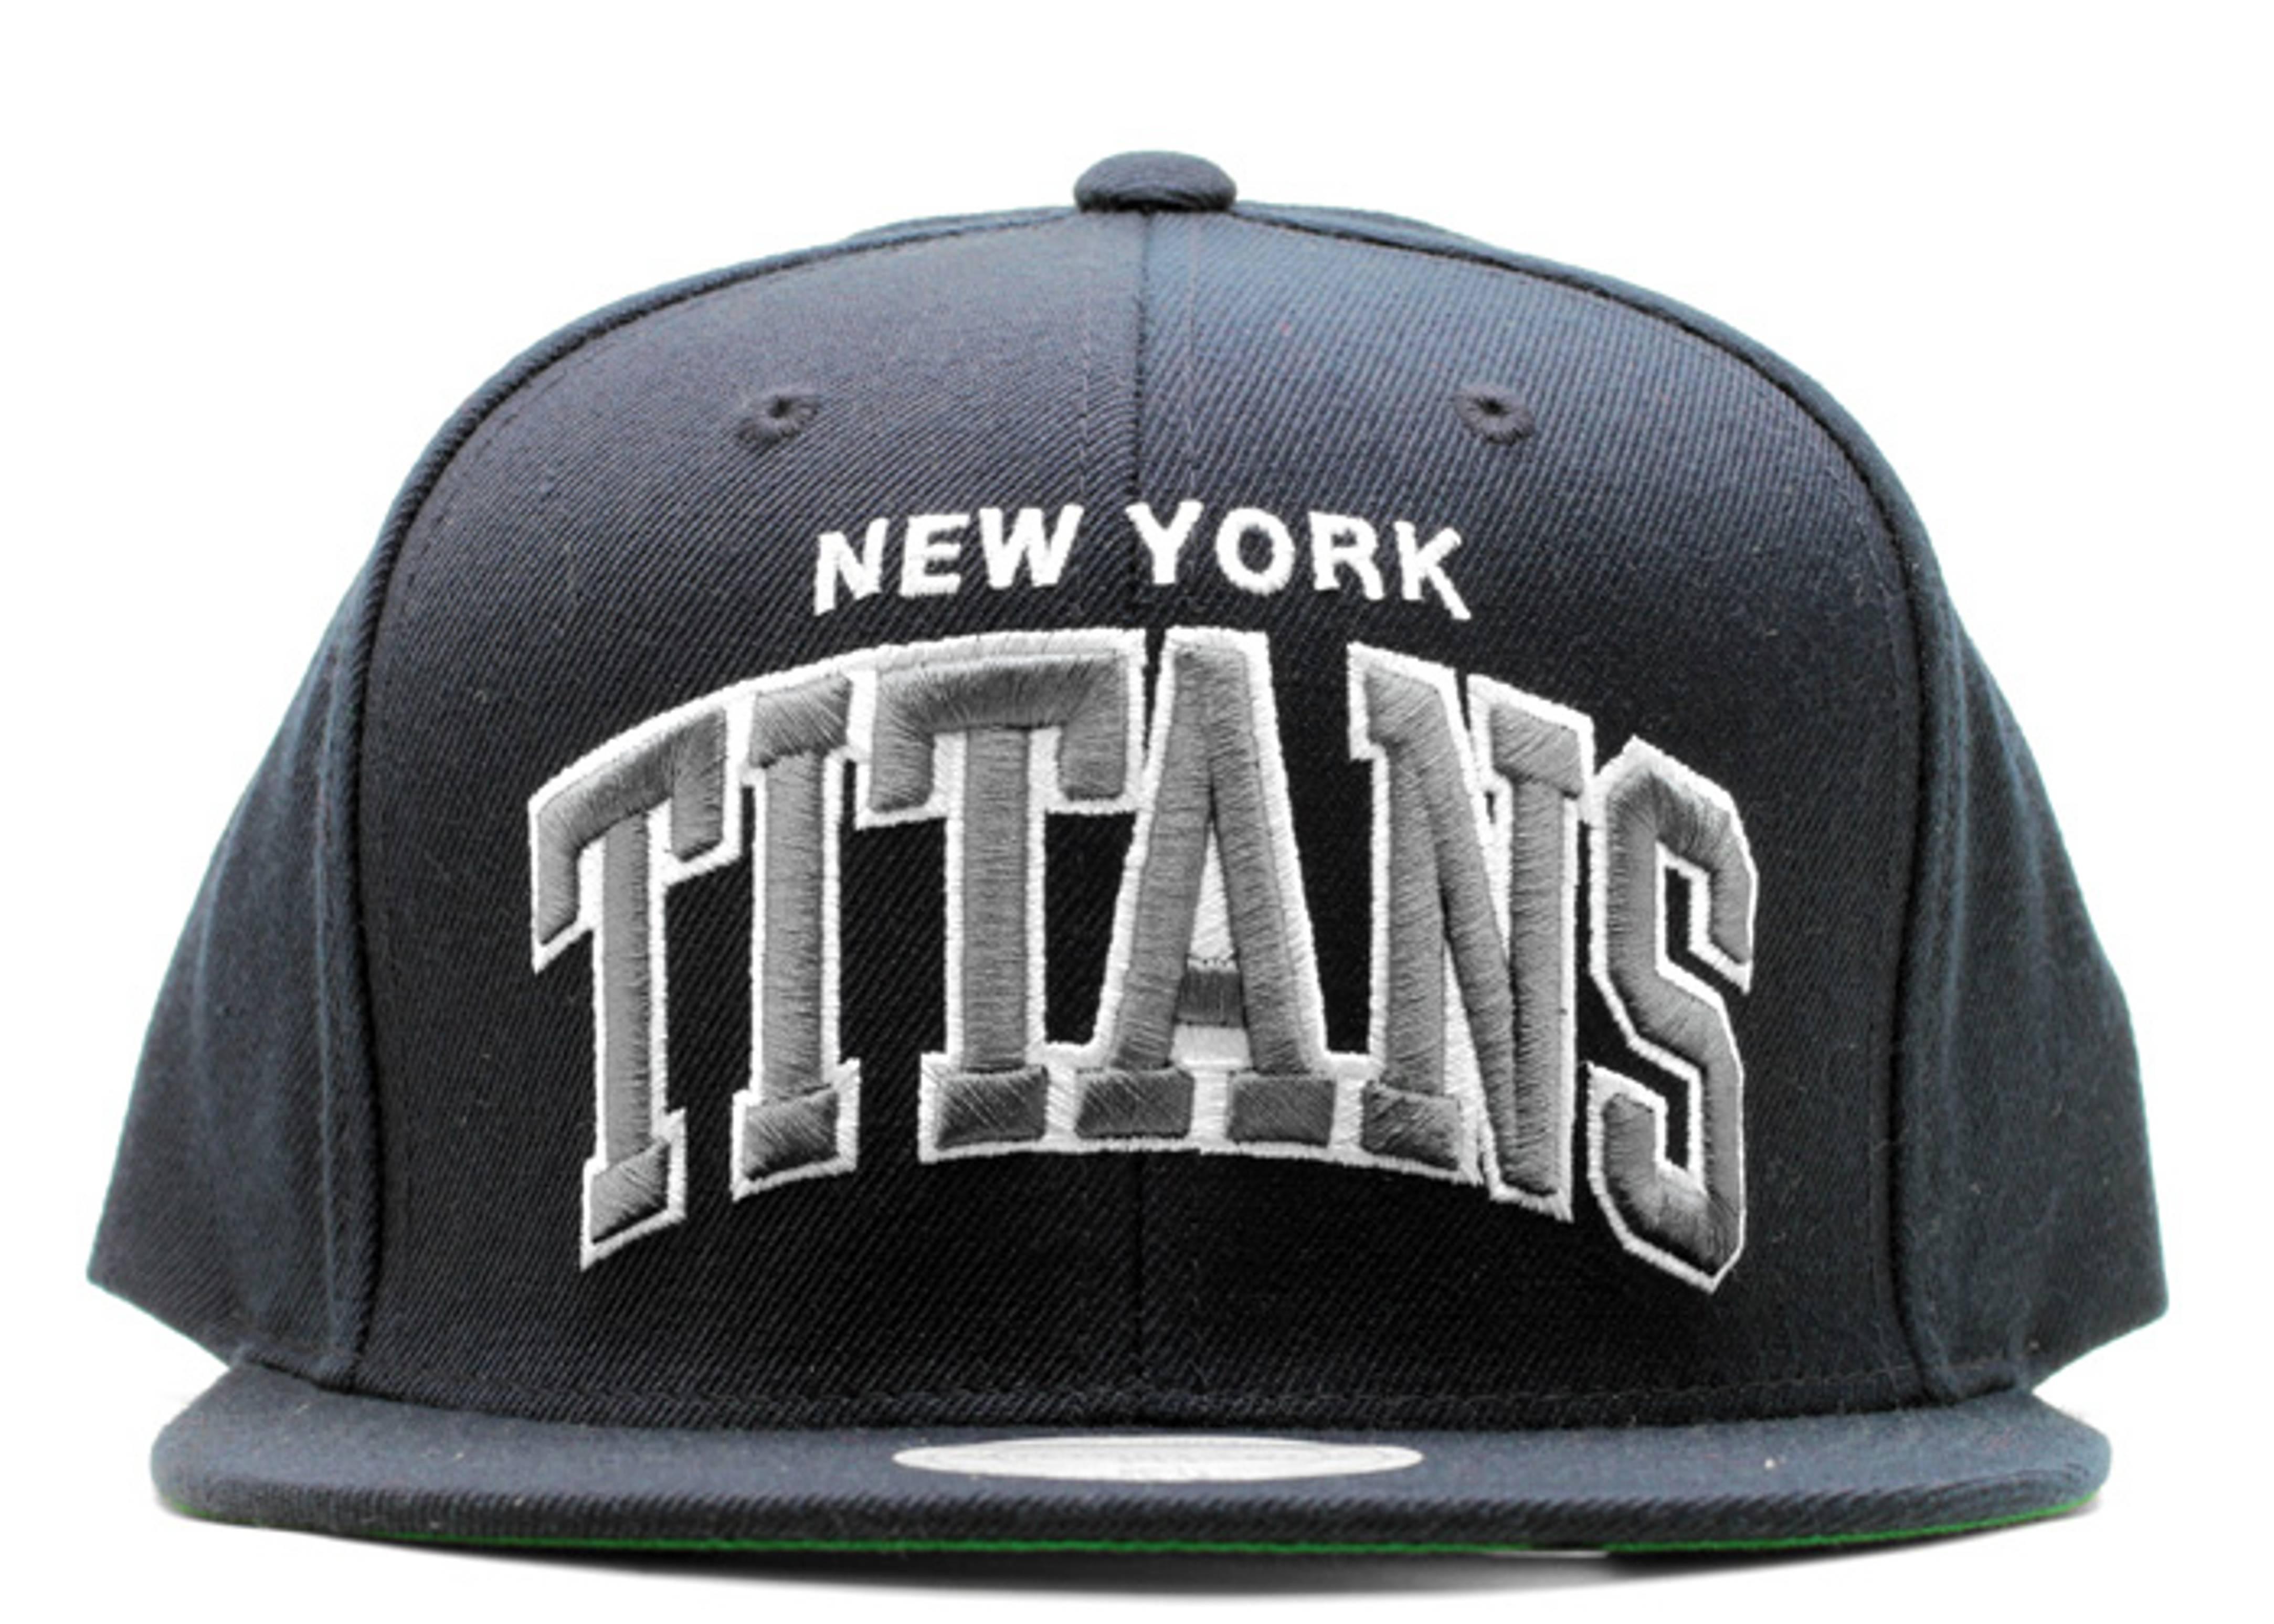 new york titans snap-back